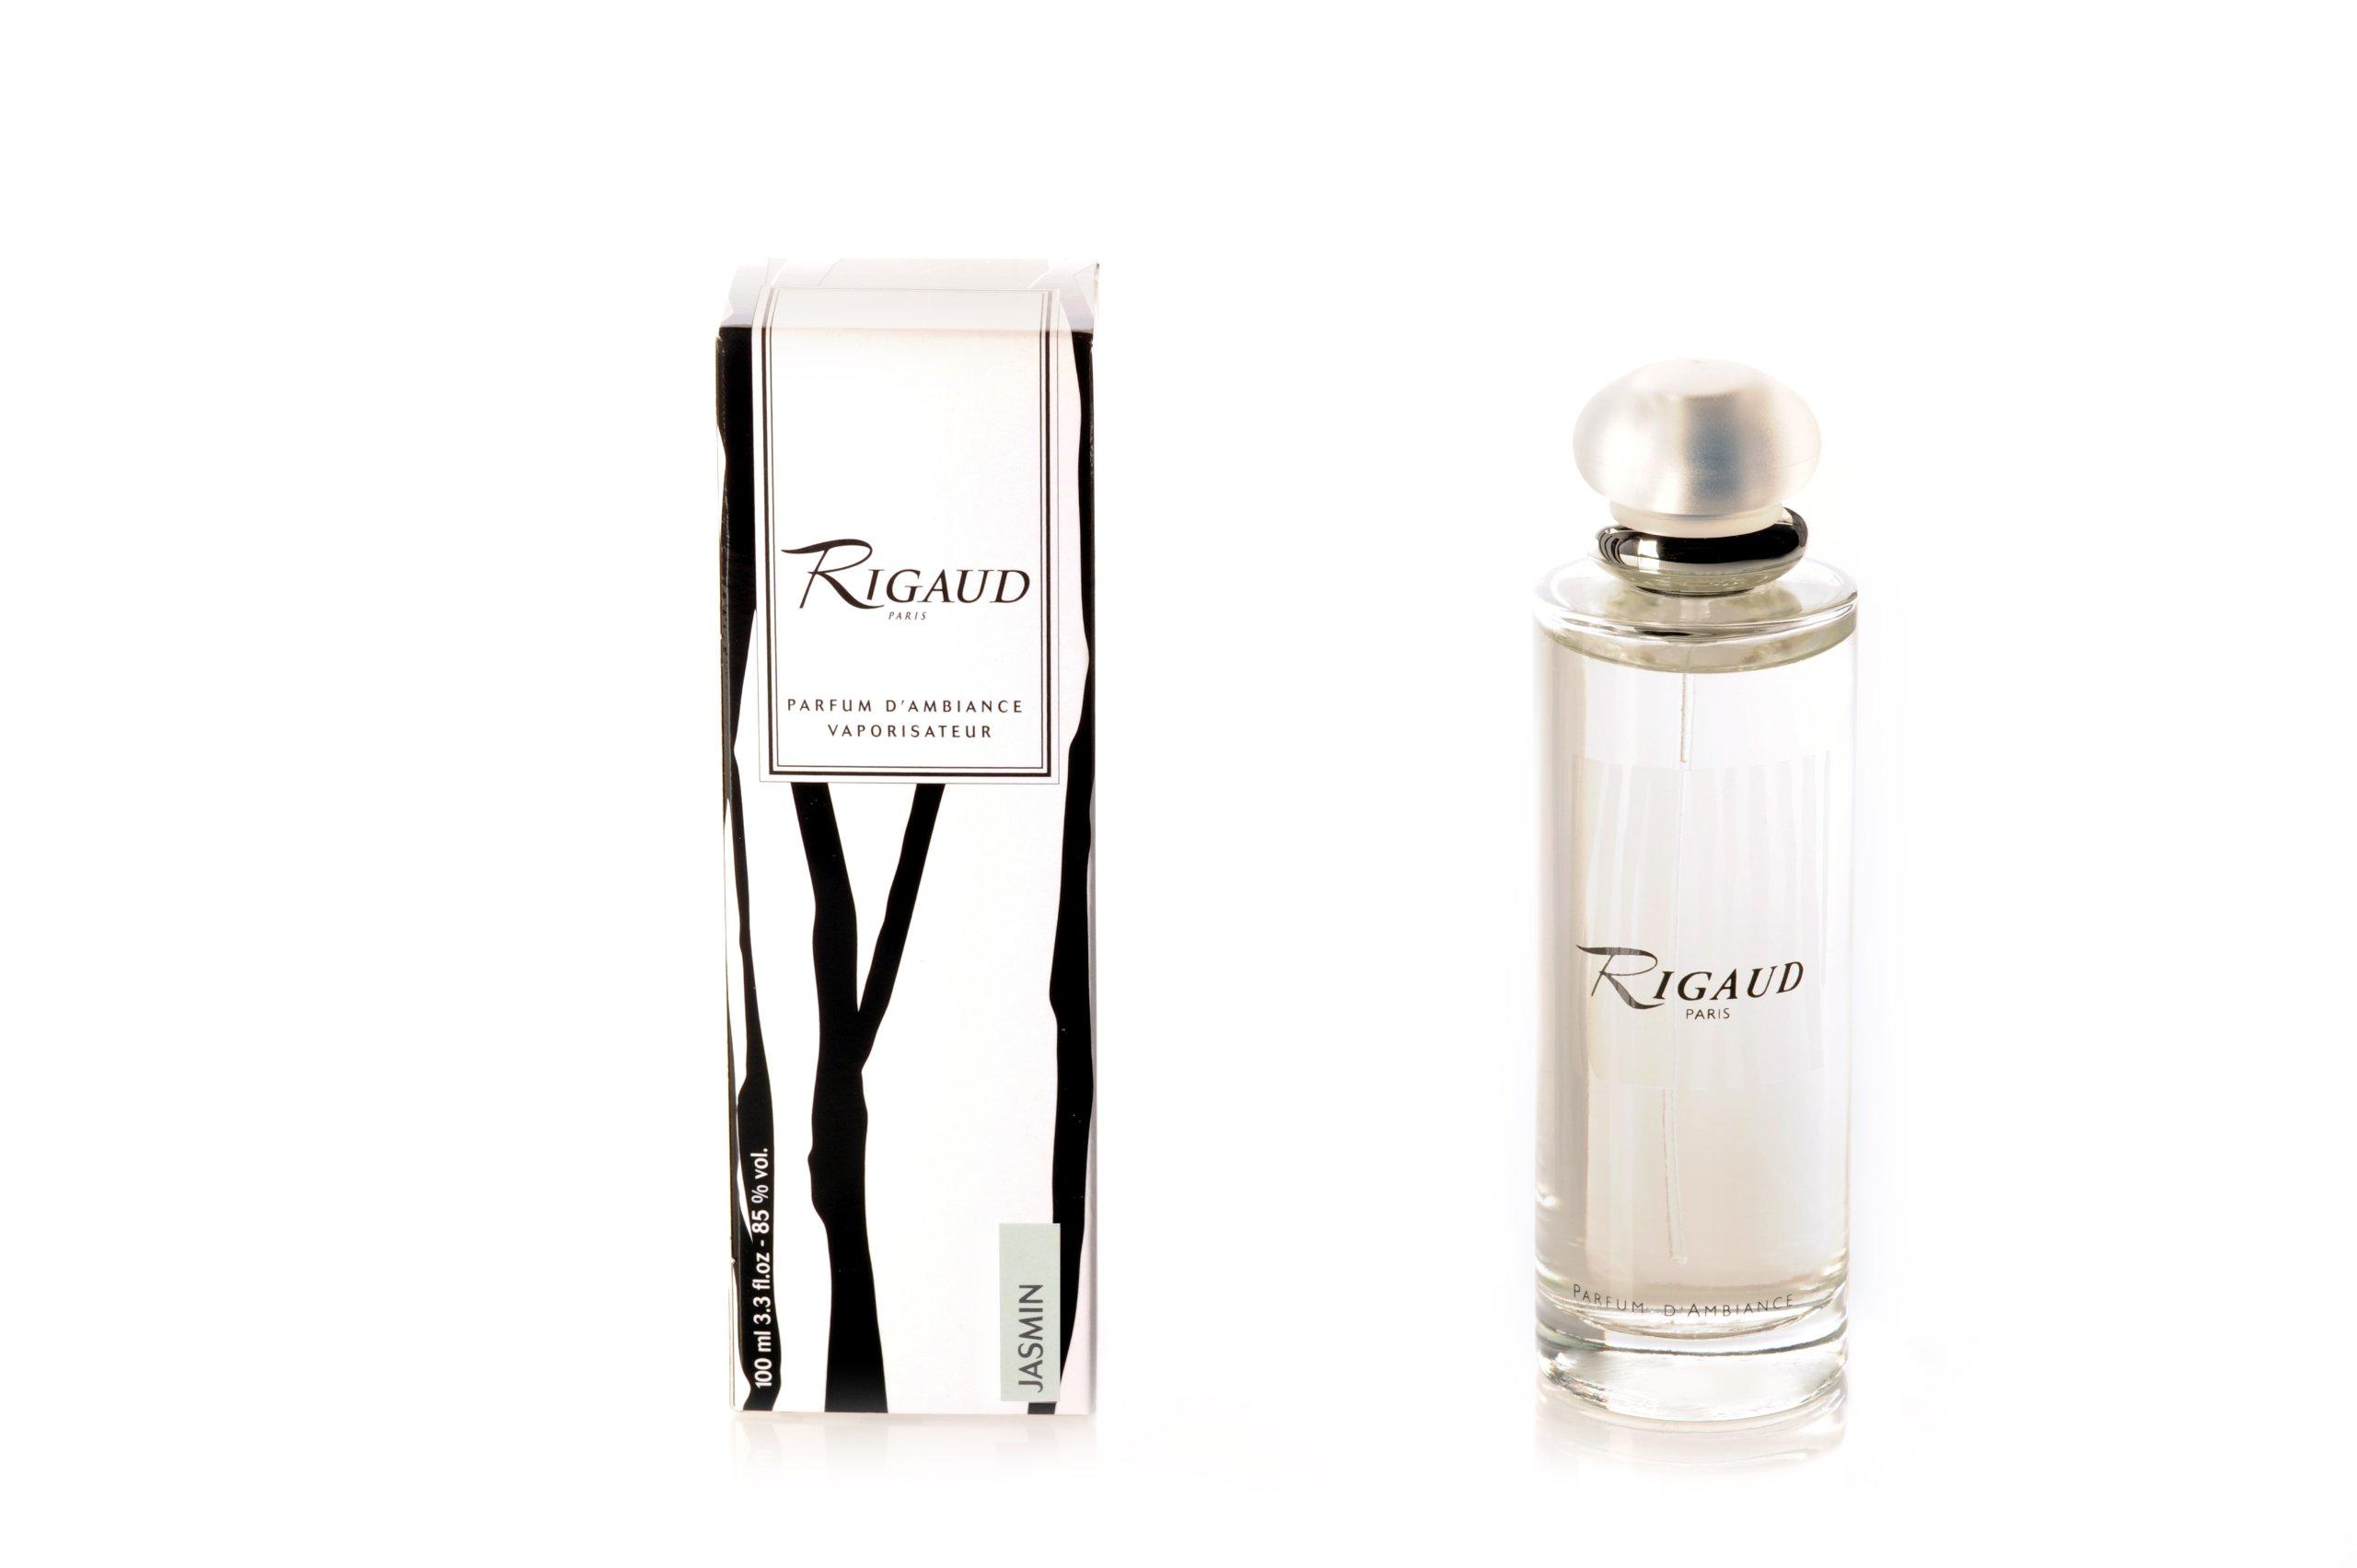 Rigaud Paris, Jasmin Room Spray / Fragrance (Parfum d'ambiance Vaporisateur), 3.3 fl. oz, Made in France by Rigaud